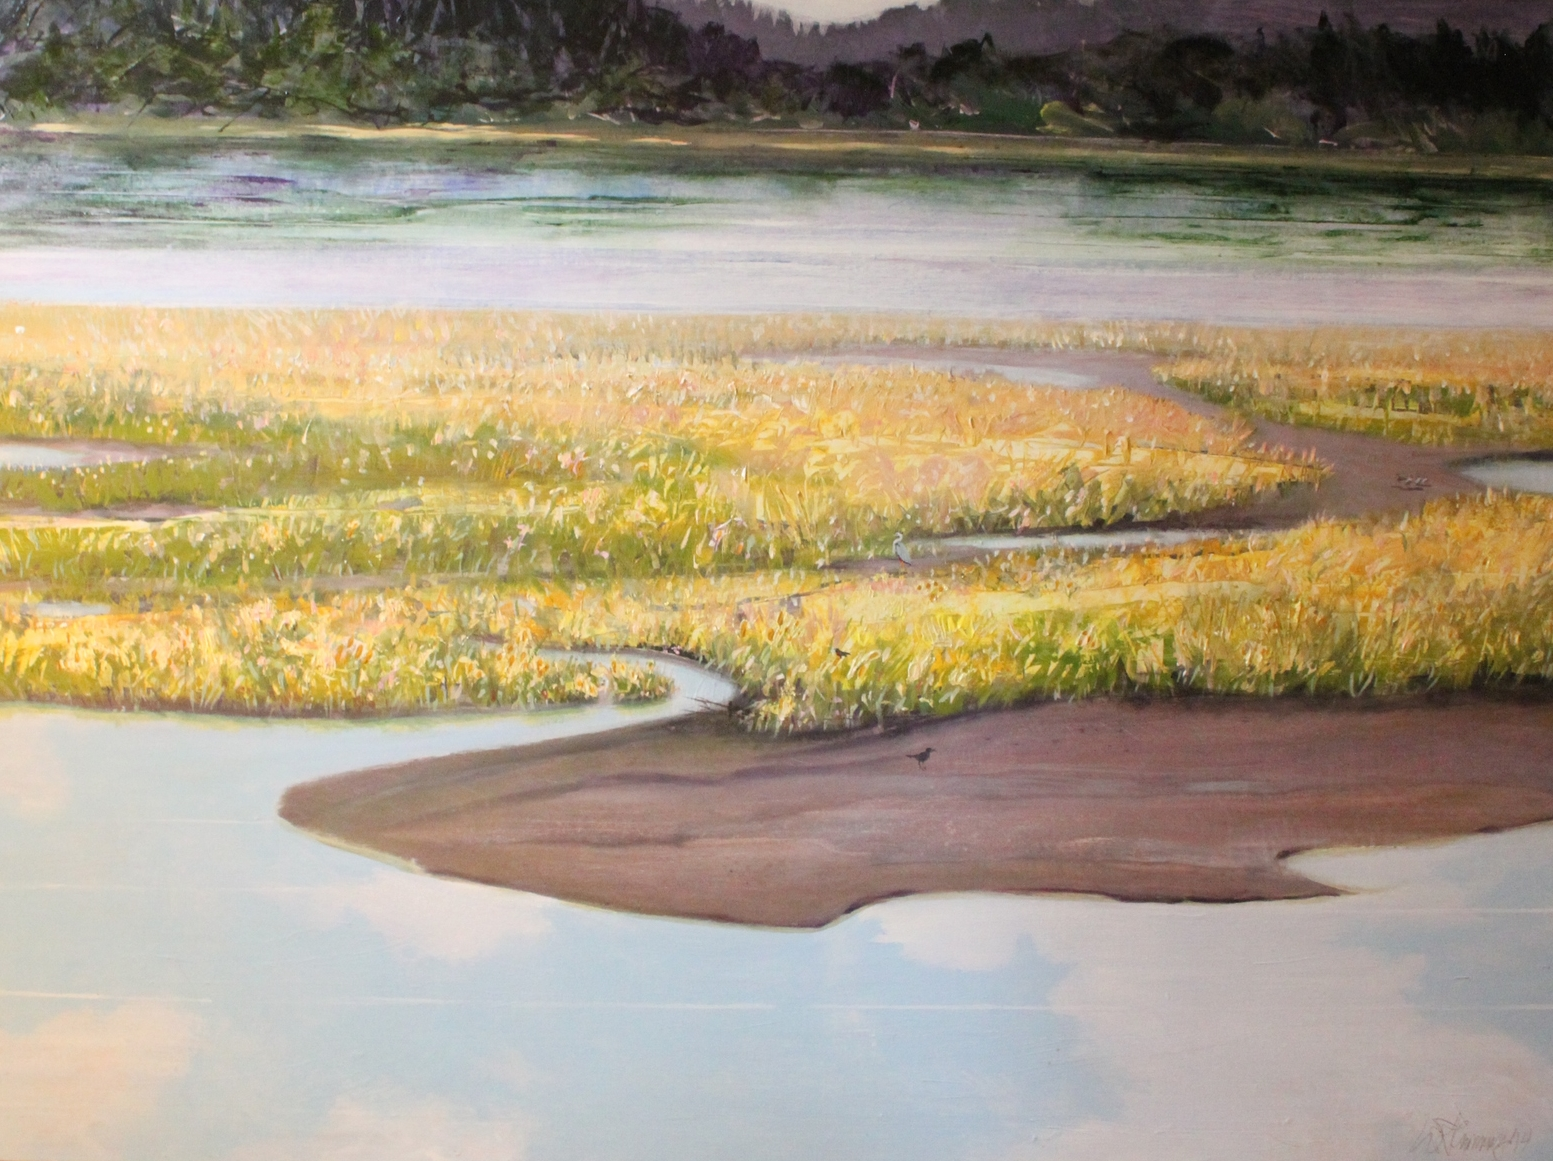 Yaquina River Watershed #10